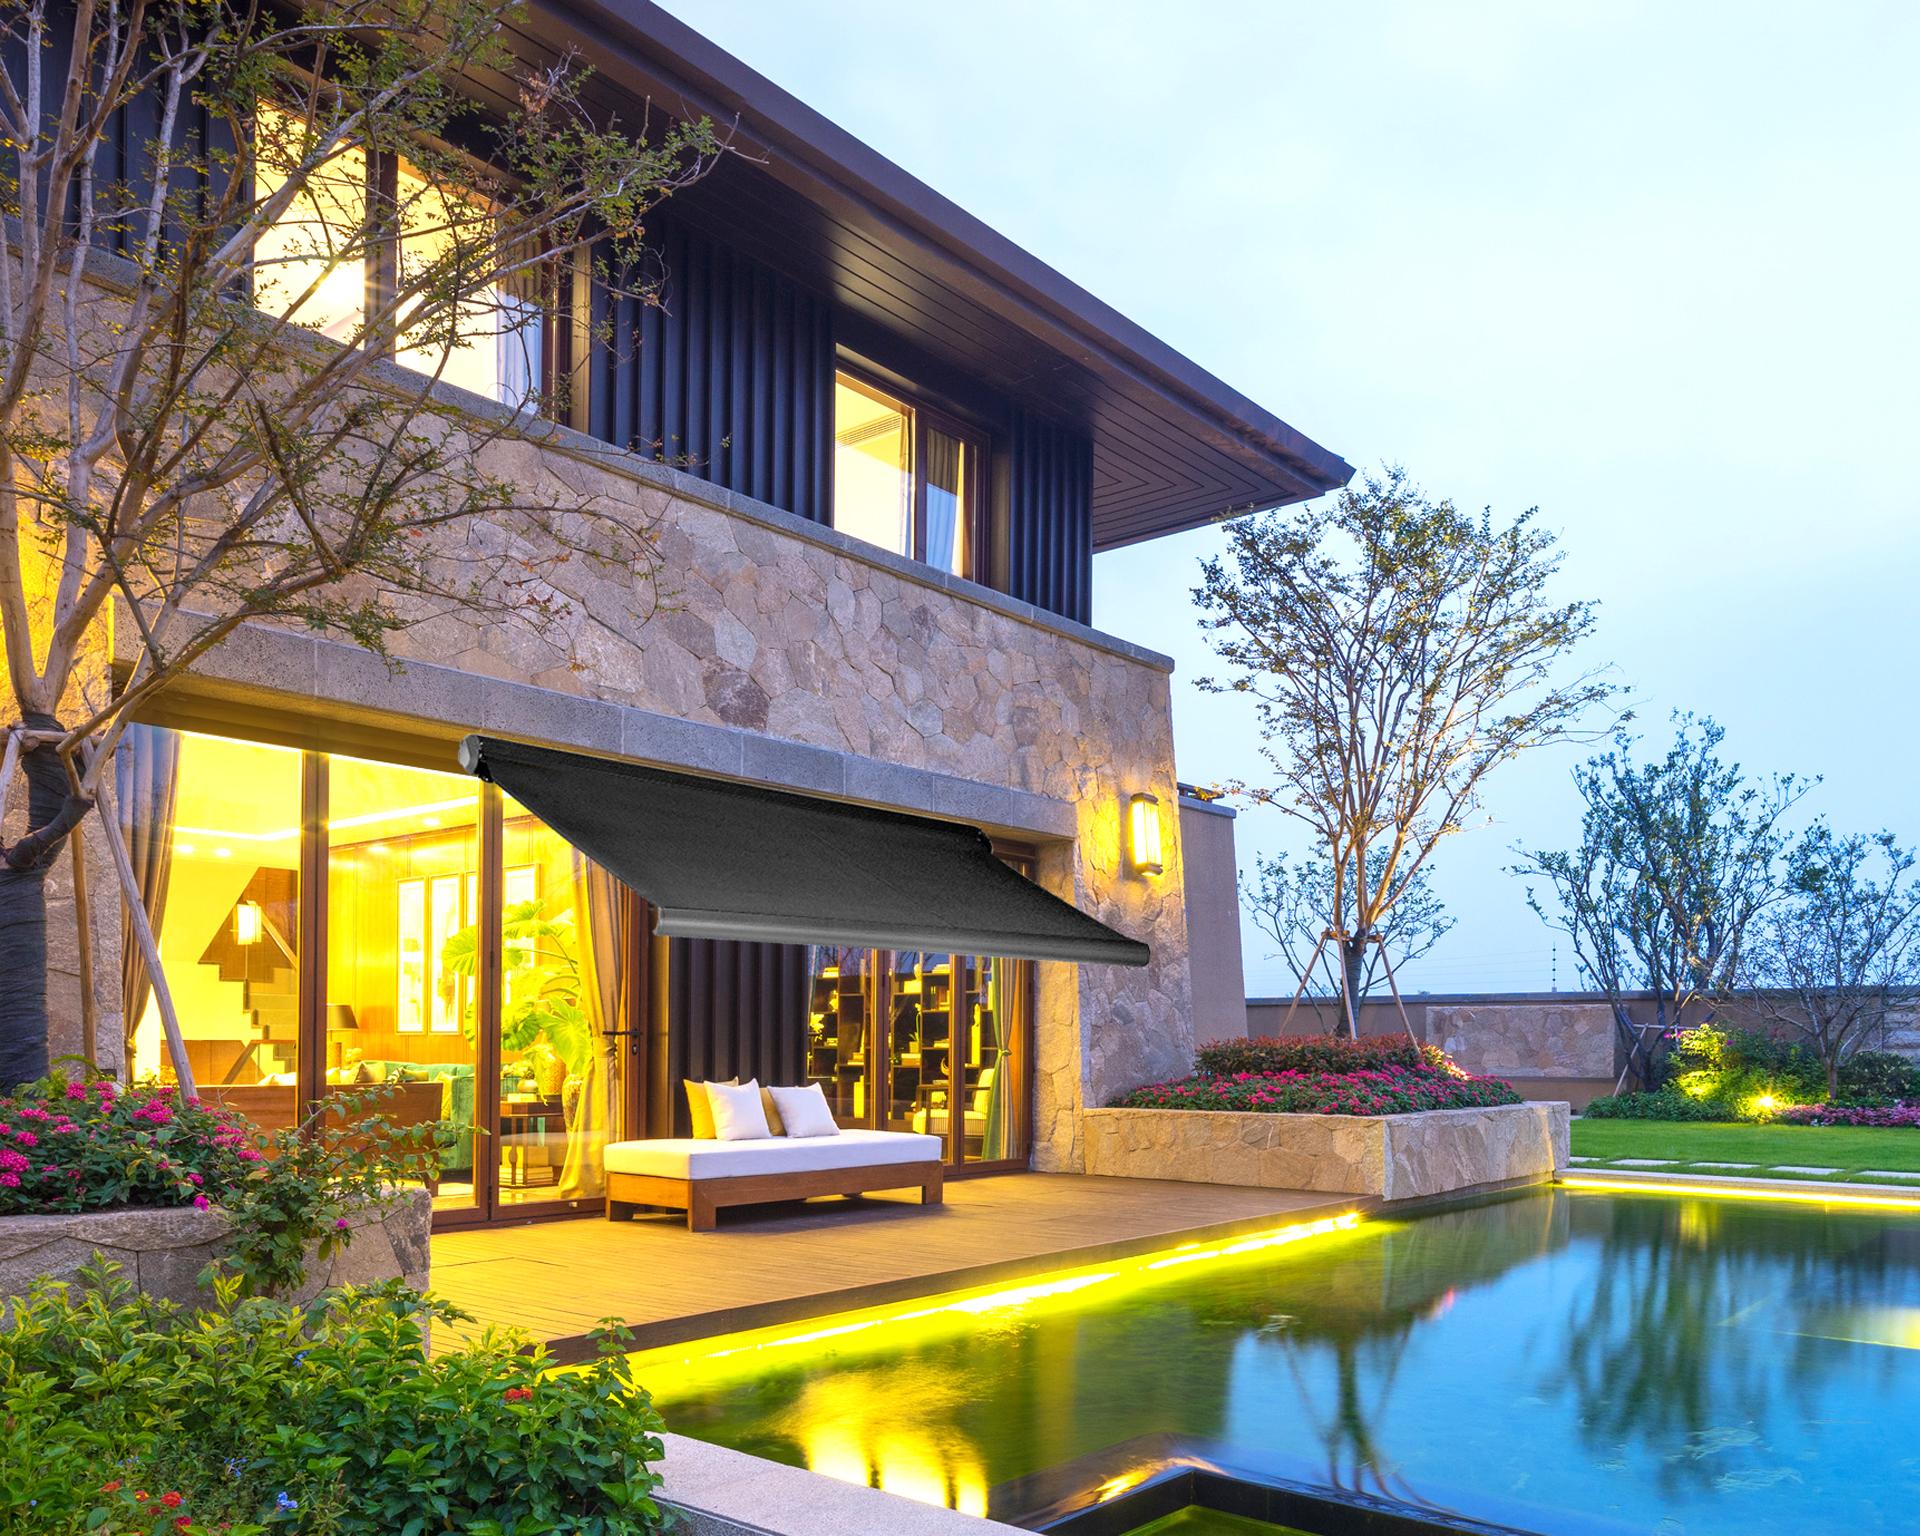 markise 4 5 3m elektronische vollkassettenmarkise terrasse sp1304 mit 2 farbe ebay. Black Bedroom Furniture Sets. Home Design Ideas